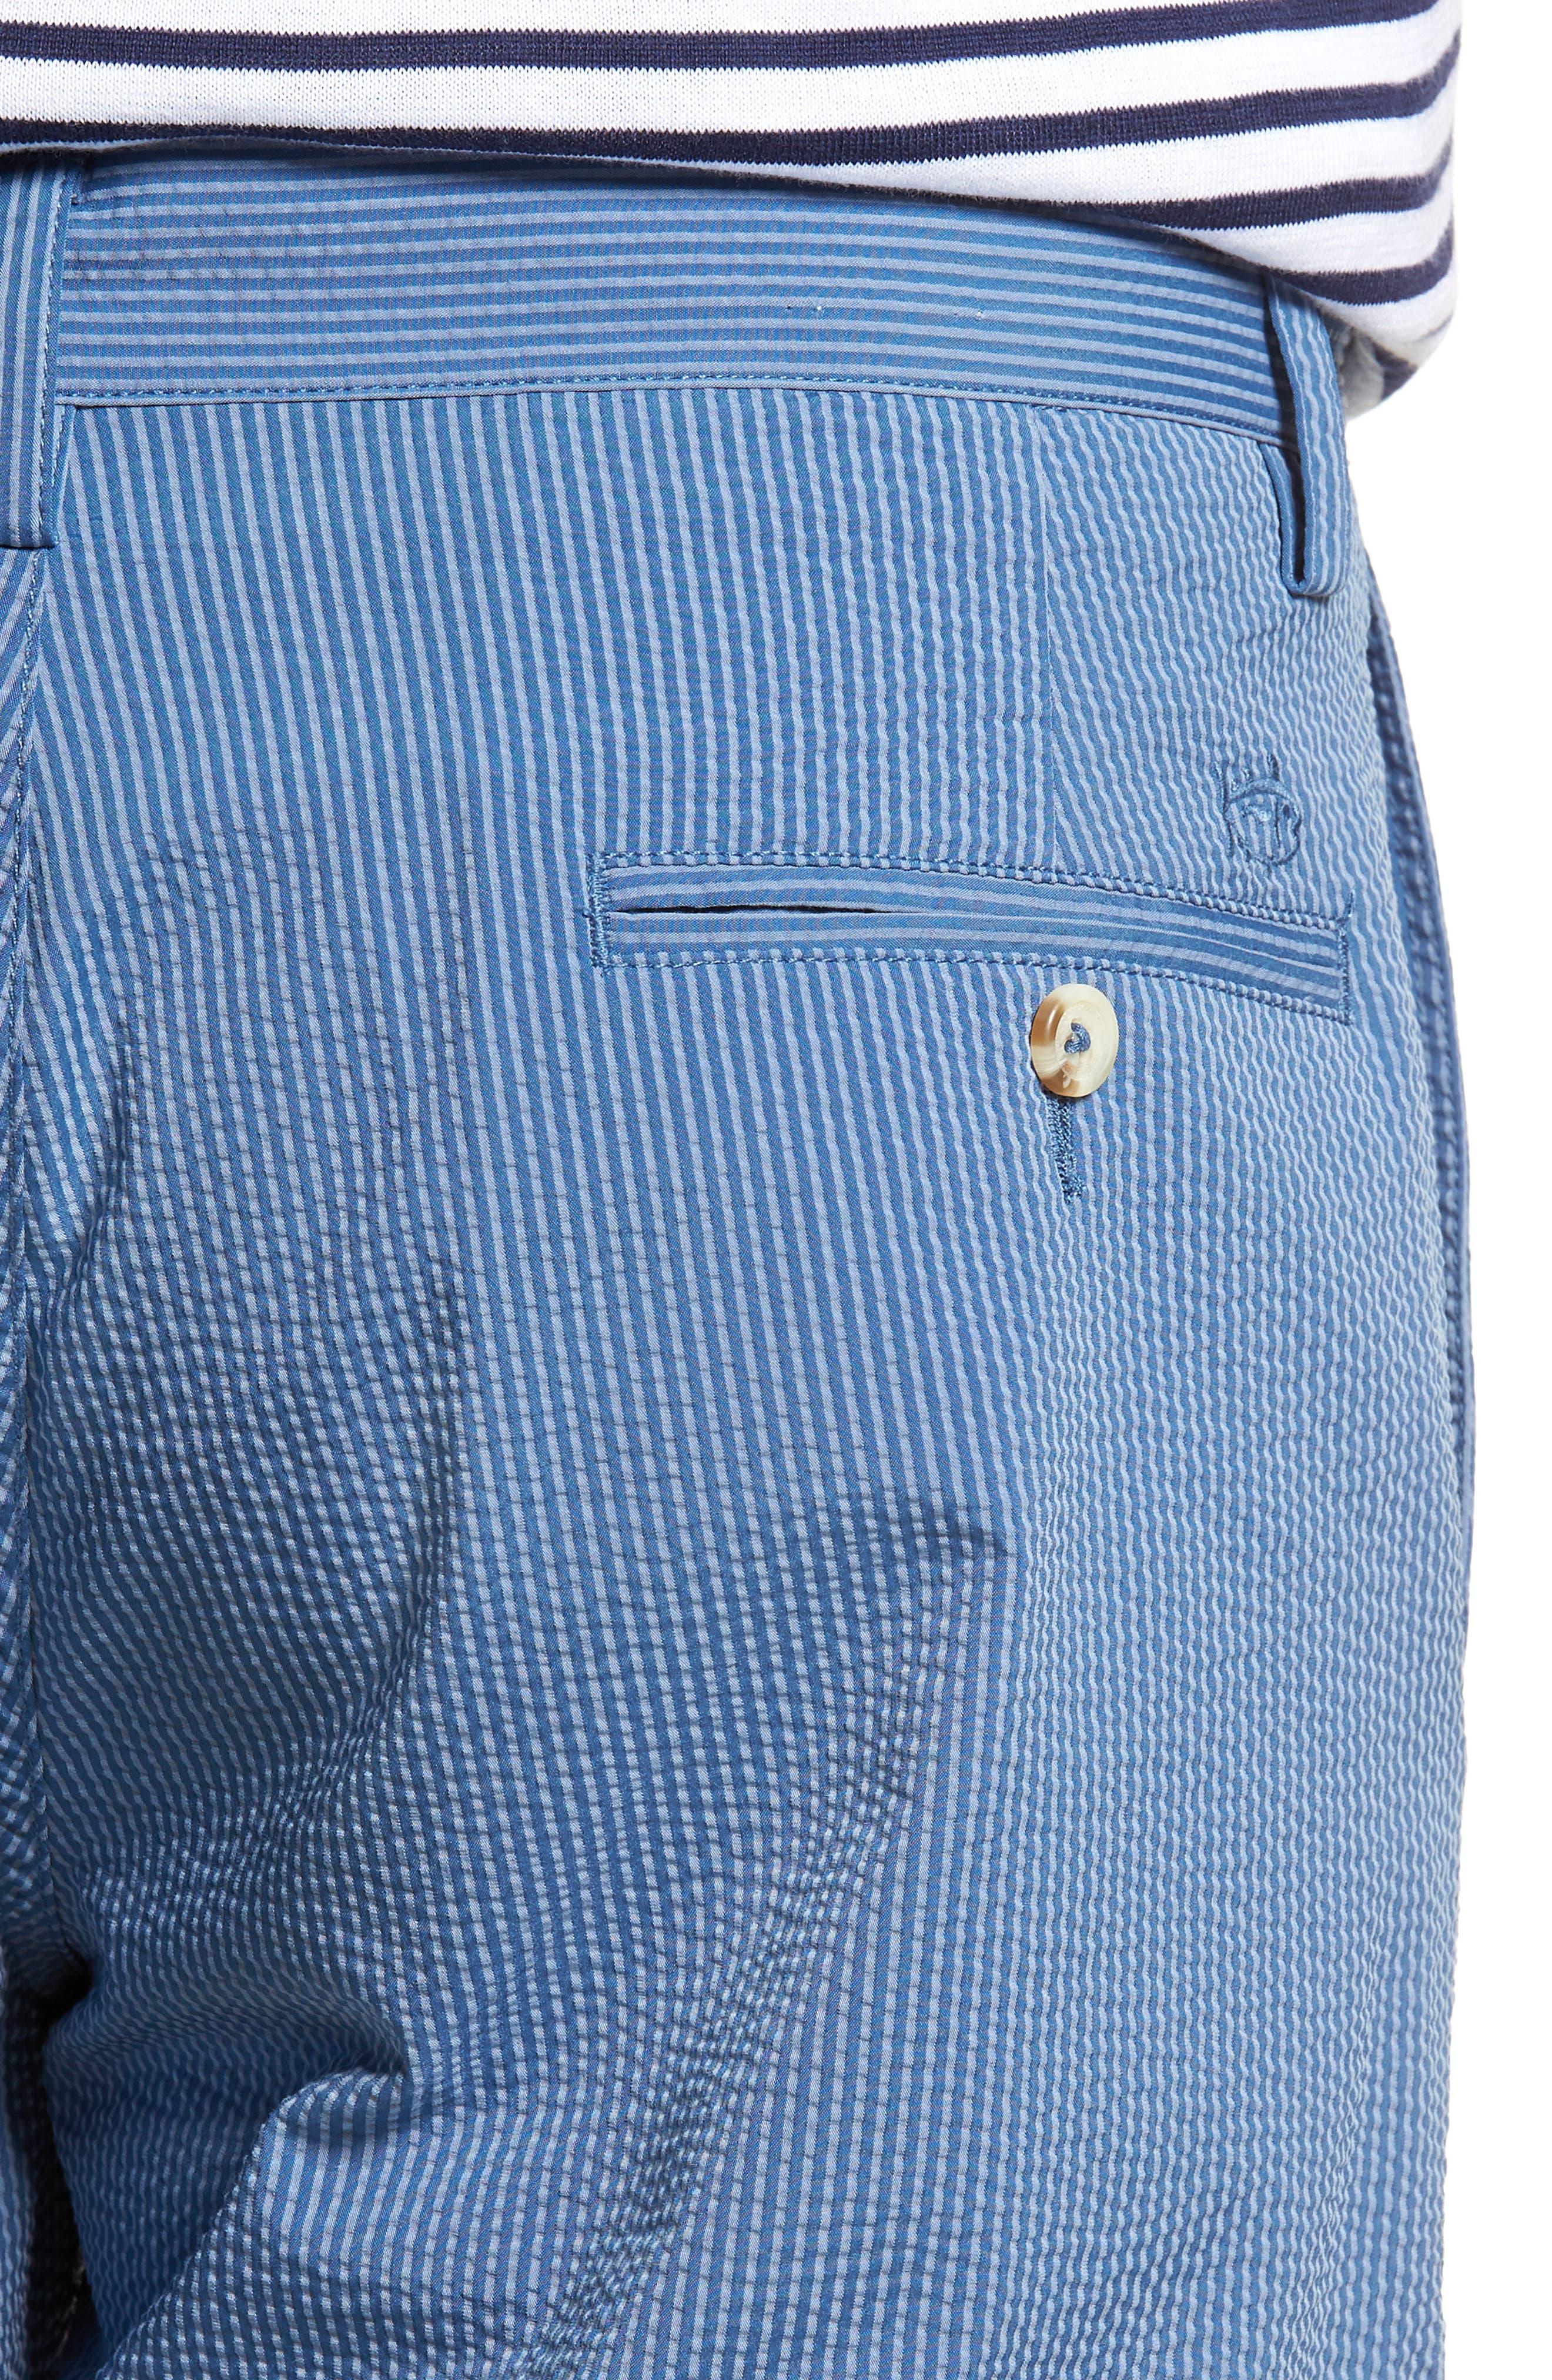 Seersucker Shorts,                             Alternate thumbnail 4, color,                             425